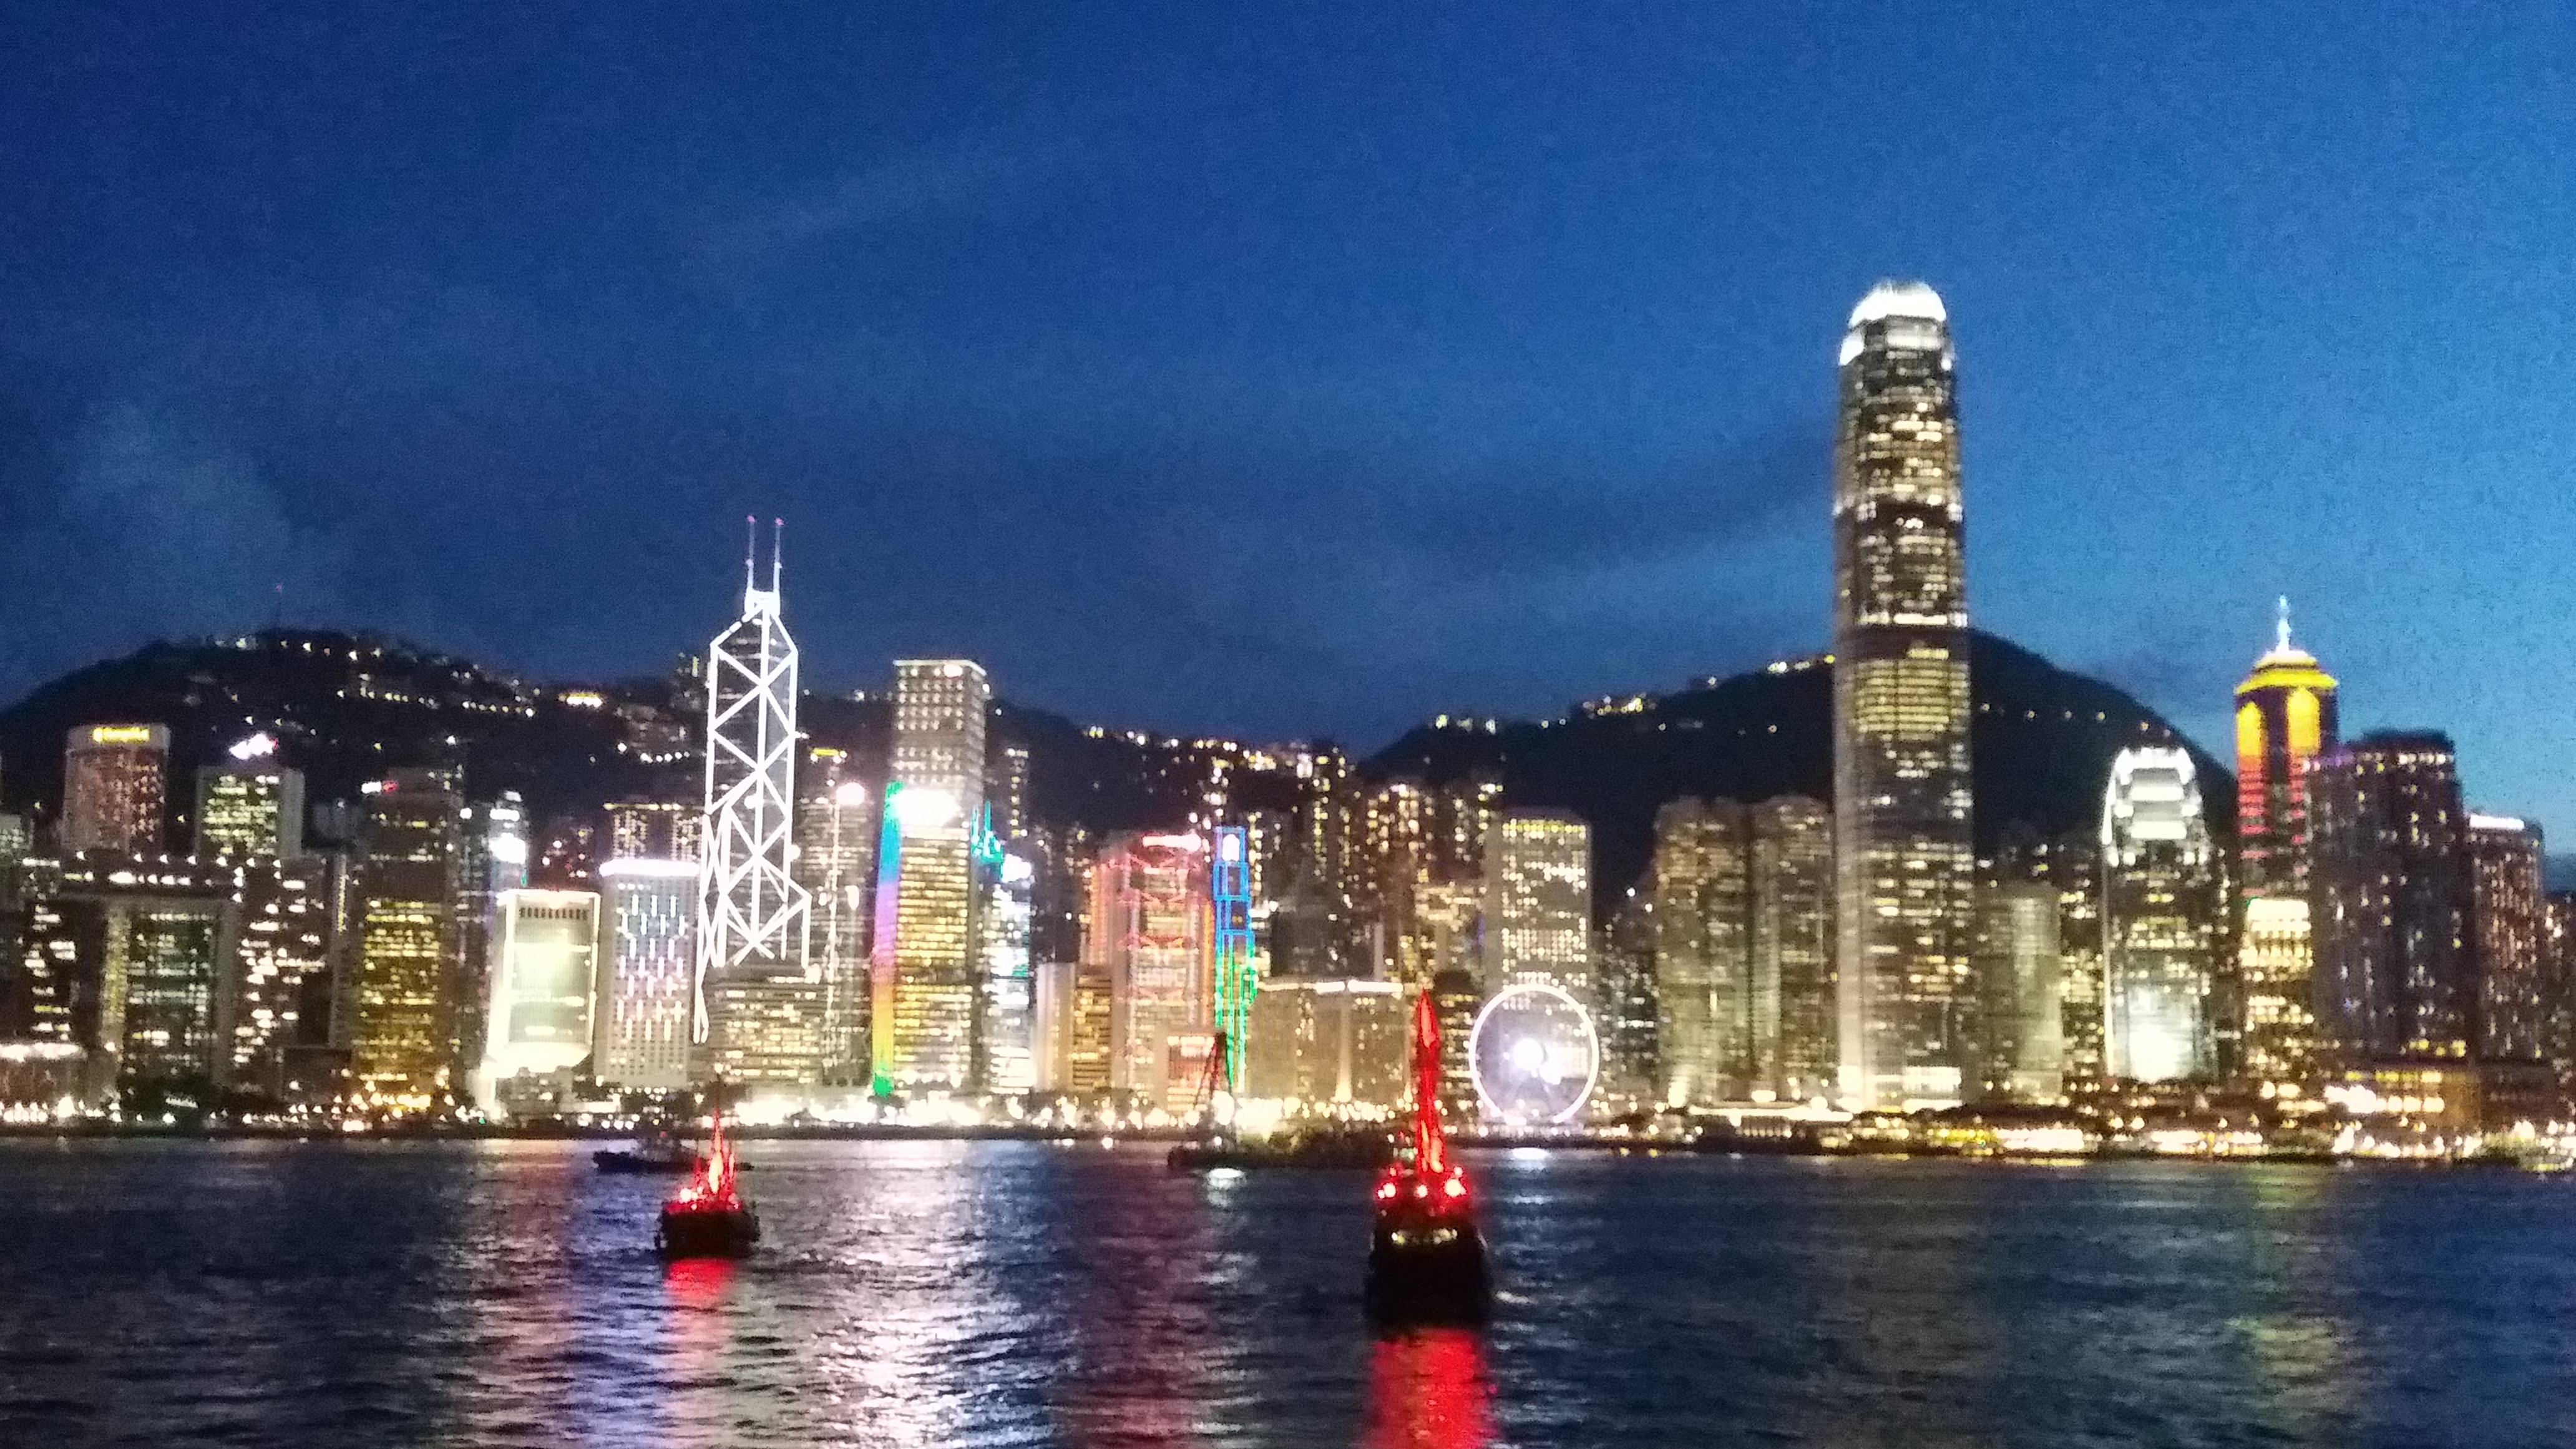 Hong Kong Skyline: From Sunset to Evening